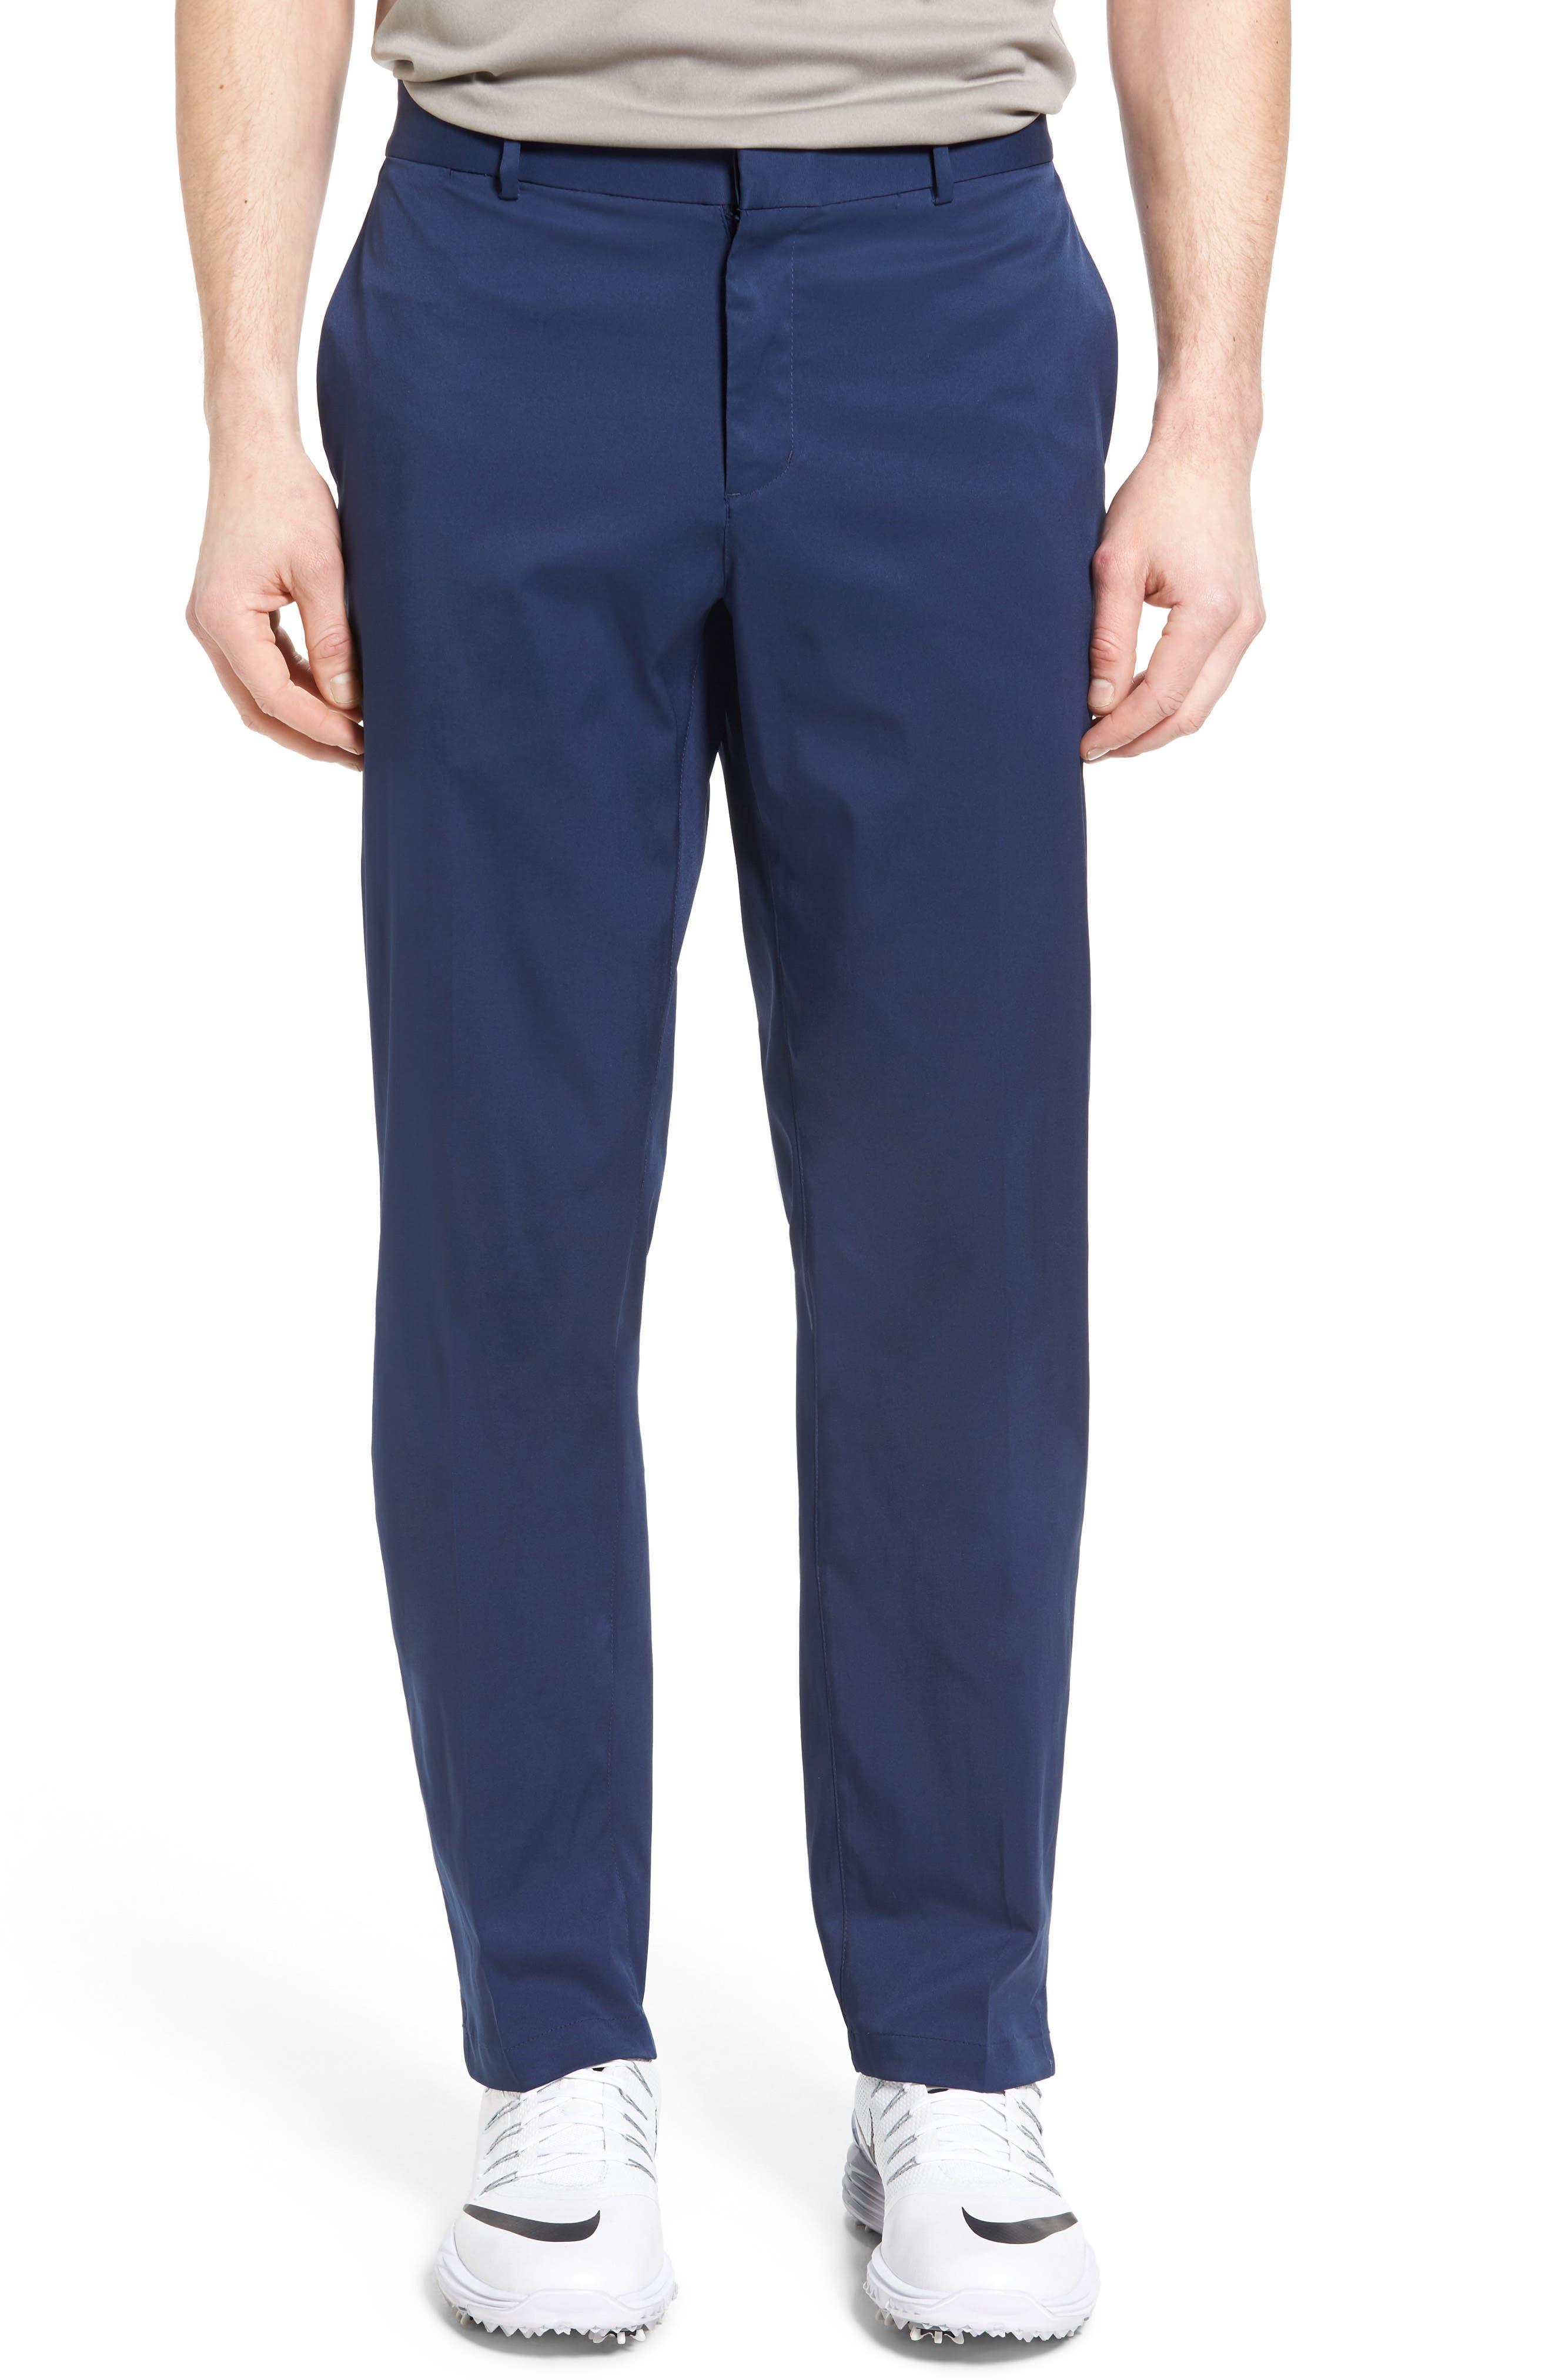 Flat Front Dri-FIT Tech Golf Pants,                             Main thumbnail 9, color,